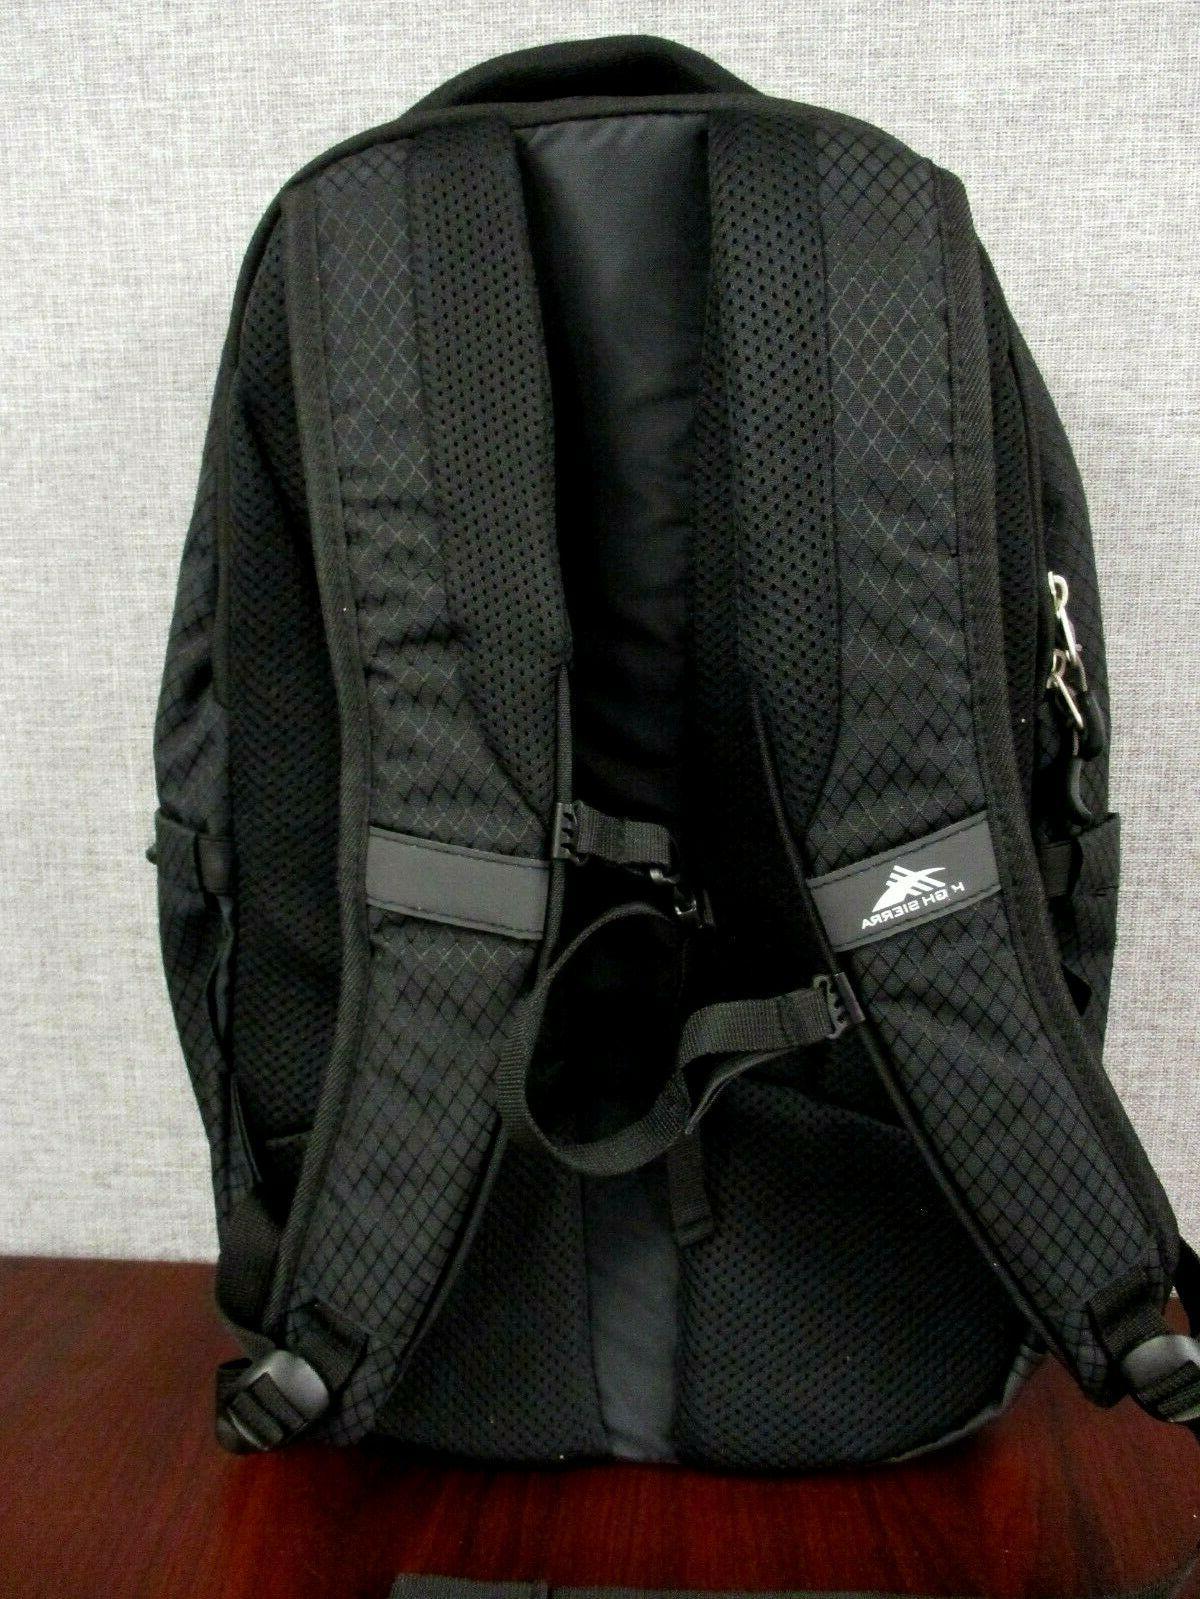 "NWOT High Sierra Everyday Backpack Black - 15"" - Light weight"